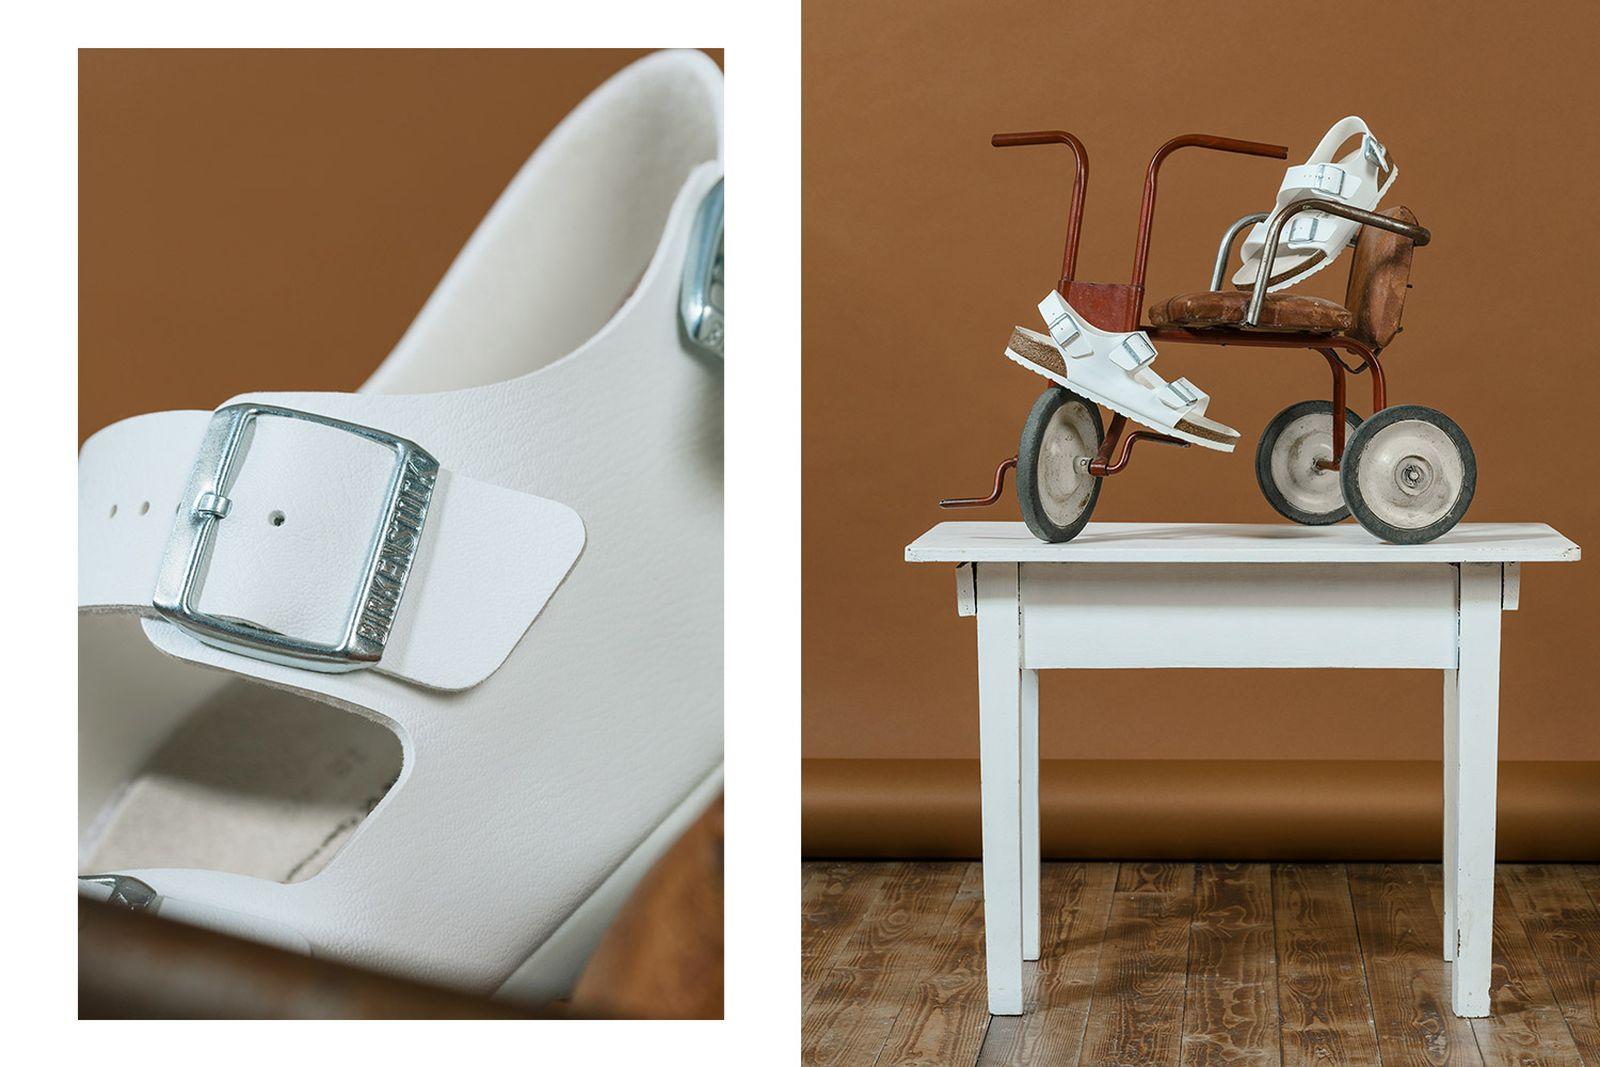 birkenstock-sandals-history-design-fashion-03